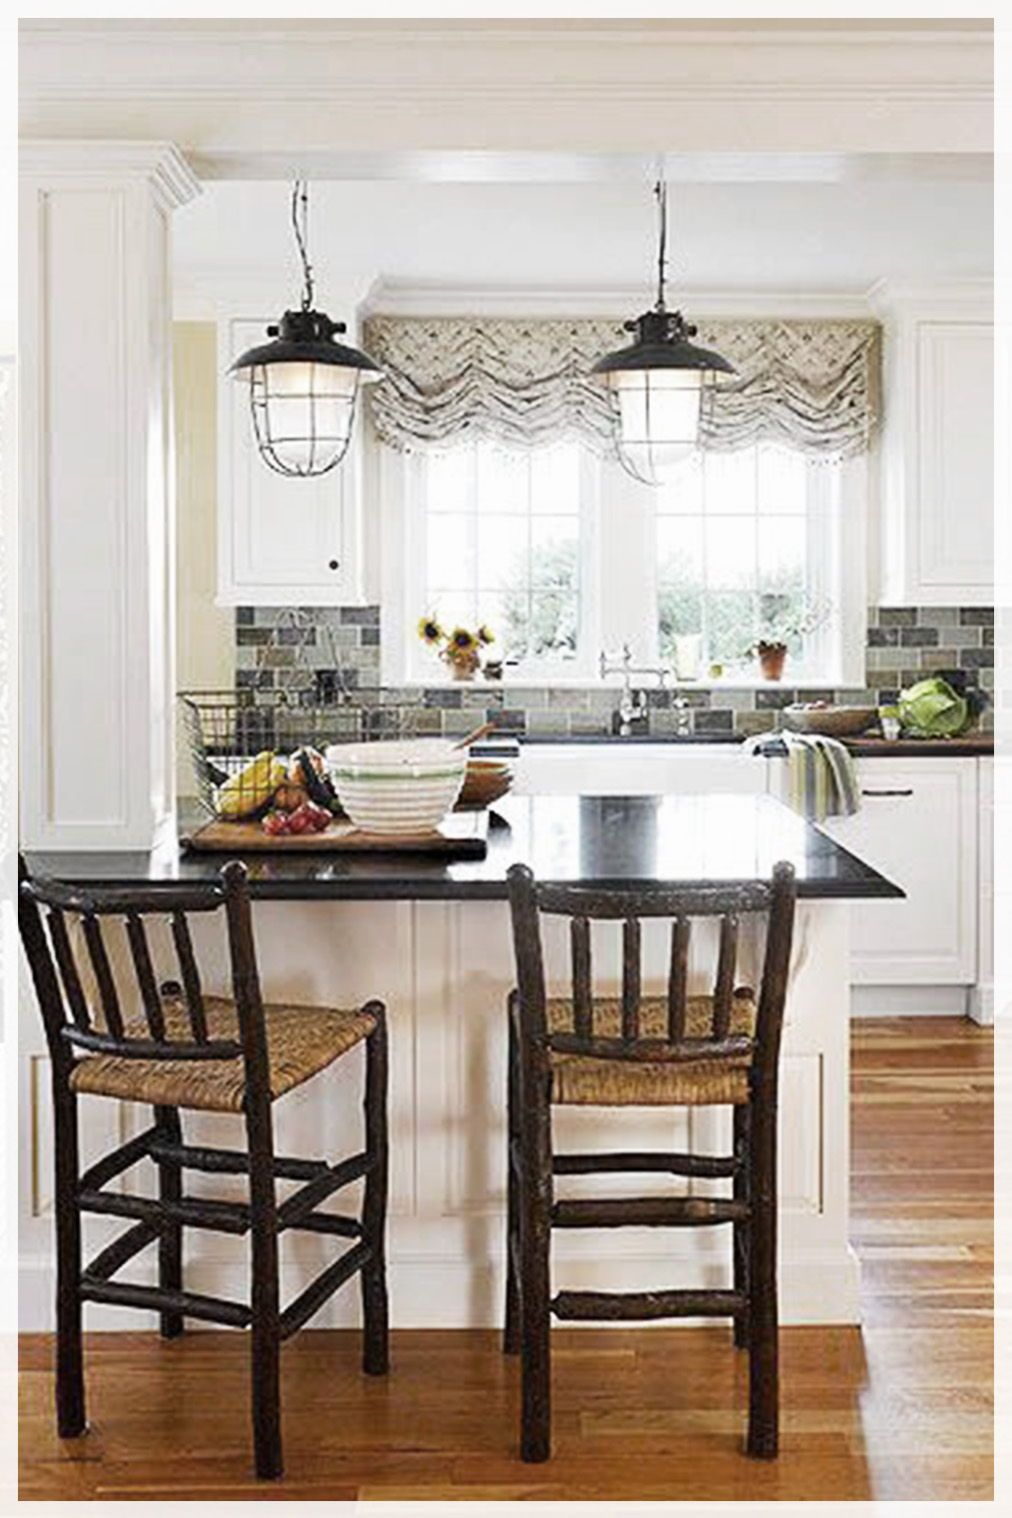 kitchen dining room combo ideas on 35 amazing kitchen dining room combo photos kitchen dining room combo dining room combo kitchen dining room combo layout pinterest